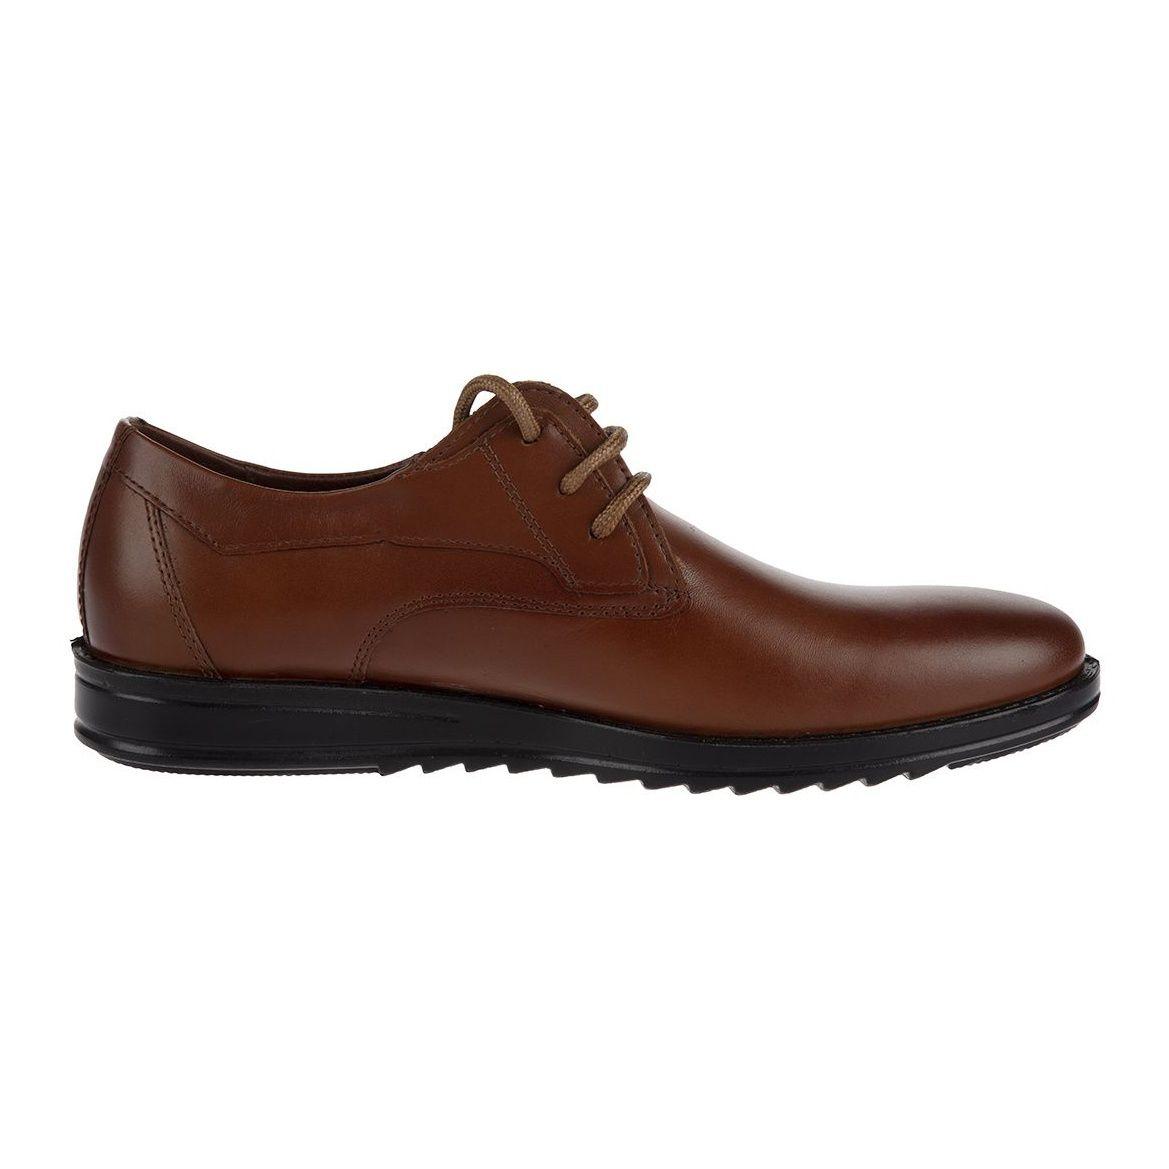 کفش روزمره مردانه رادین کد 1986-3 -  - 6